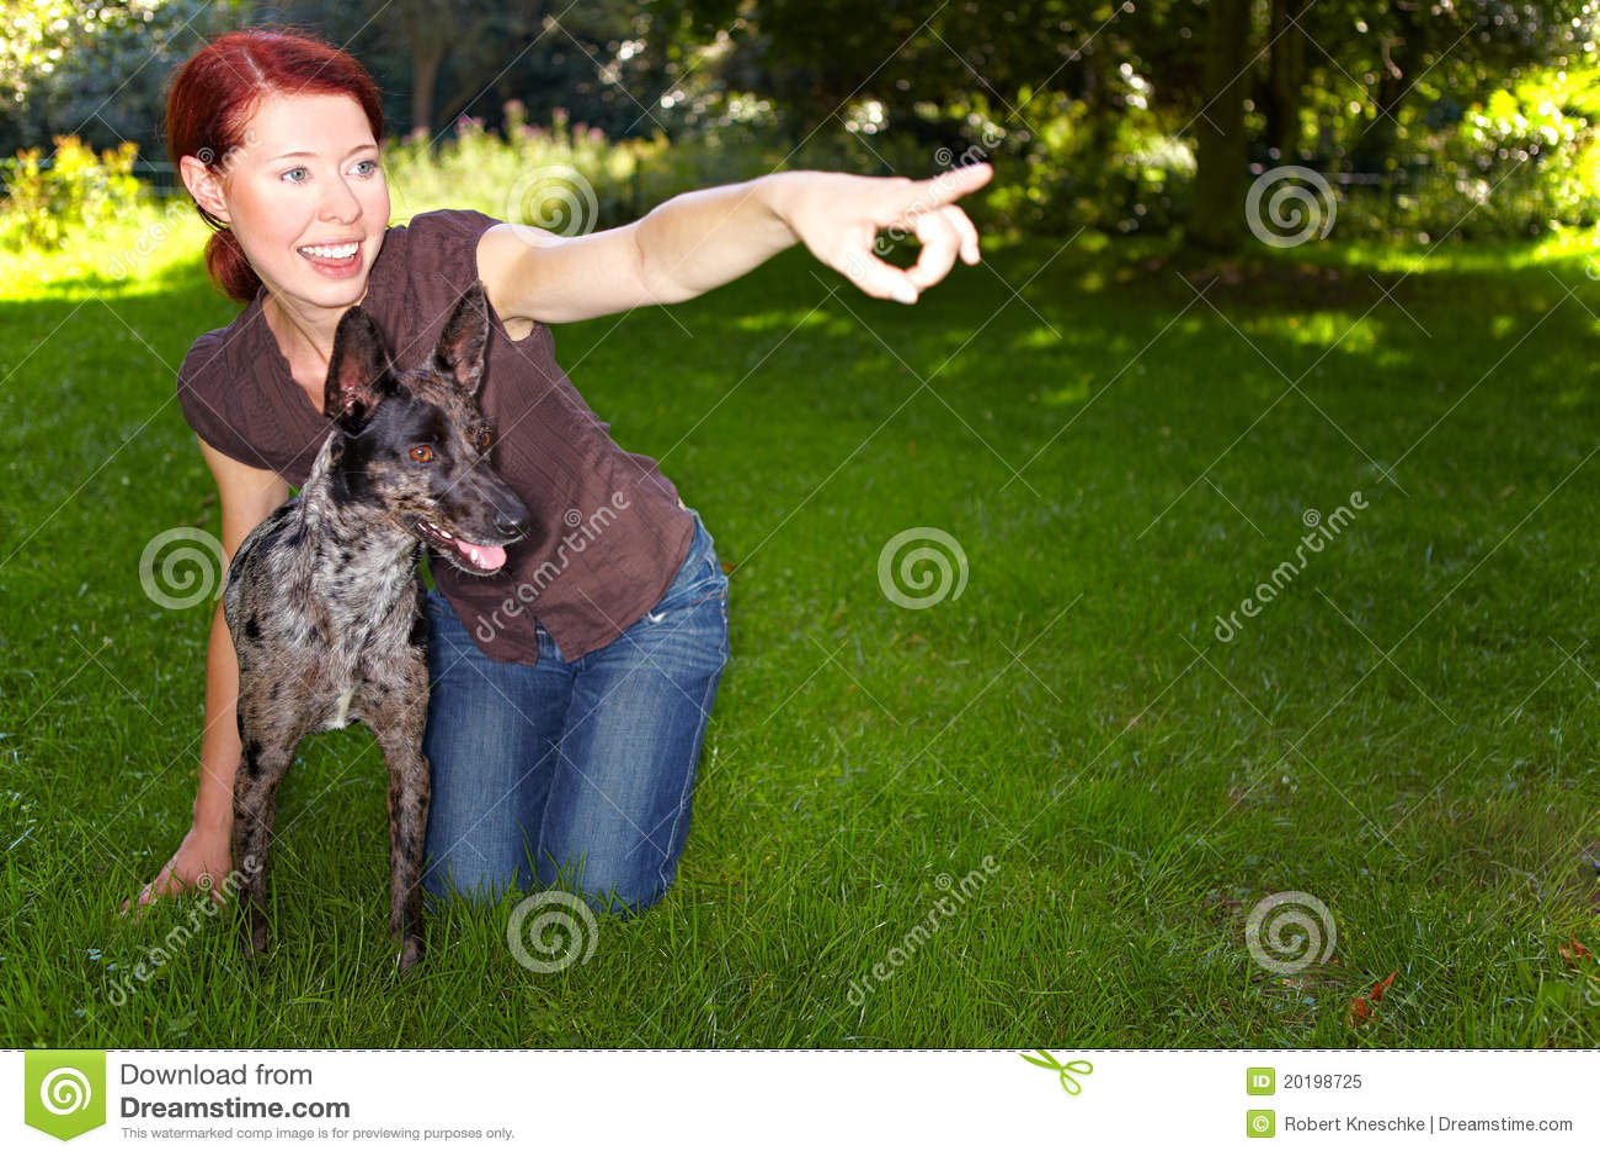 Woman teaching dog to fetch